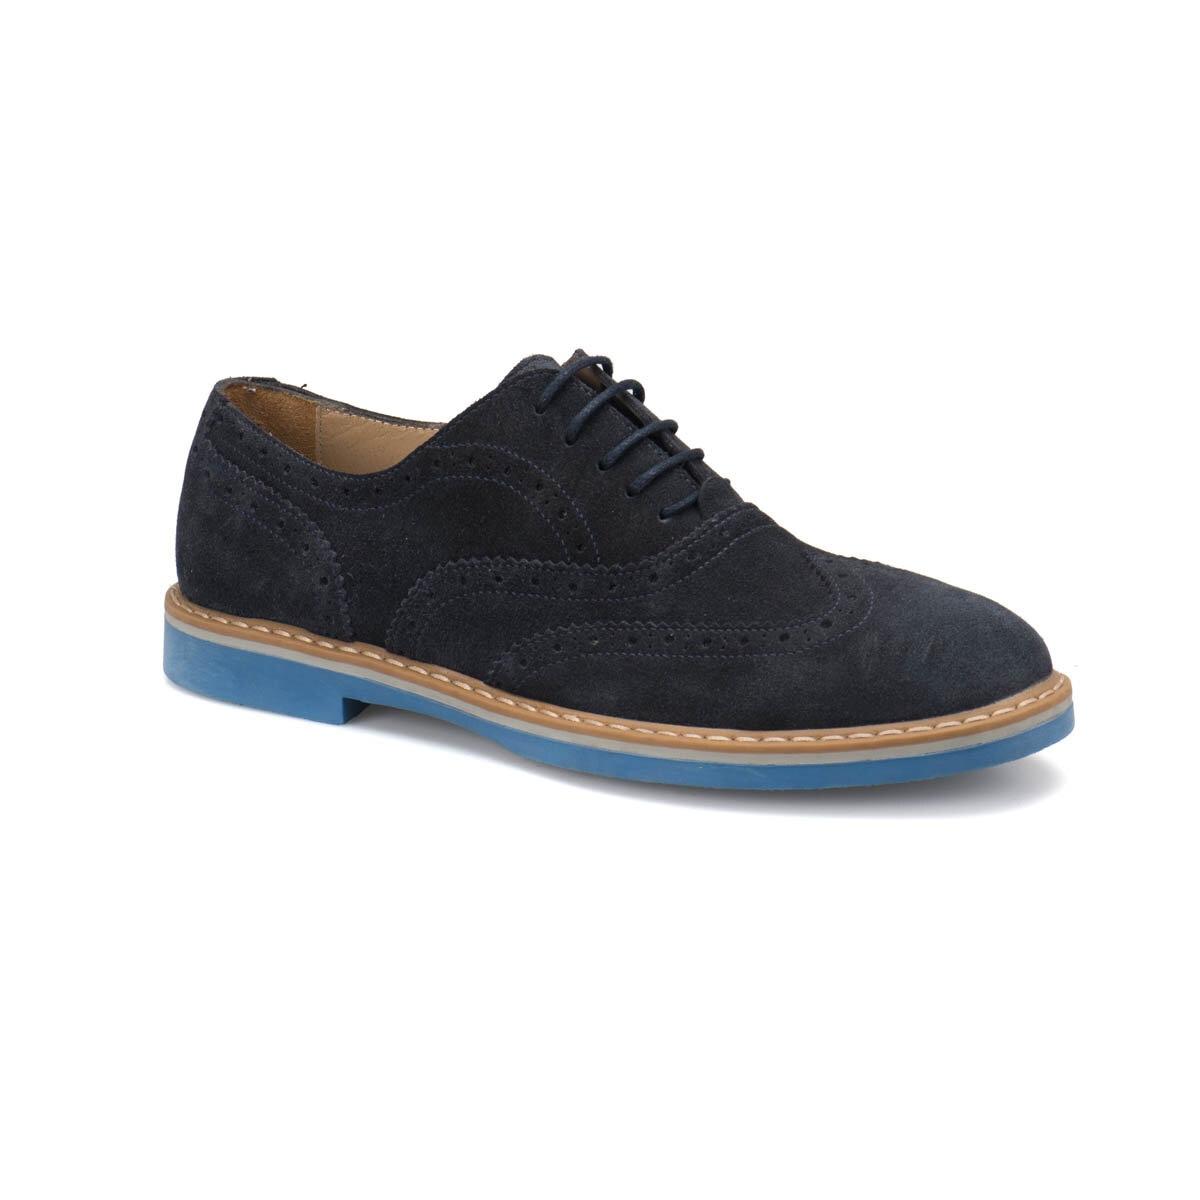 FLO 61104 M 1506 Navy Blue Men 'S Modern Shoes Garamond